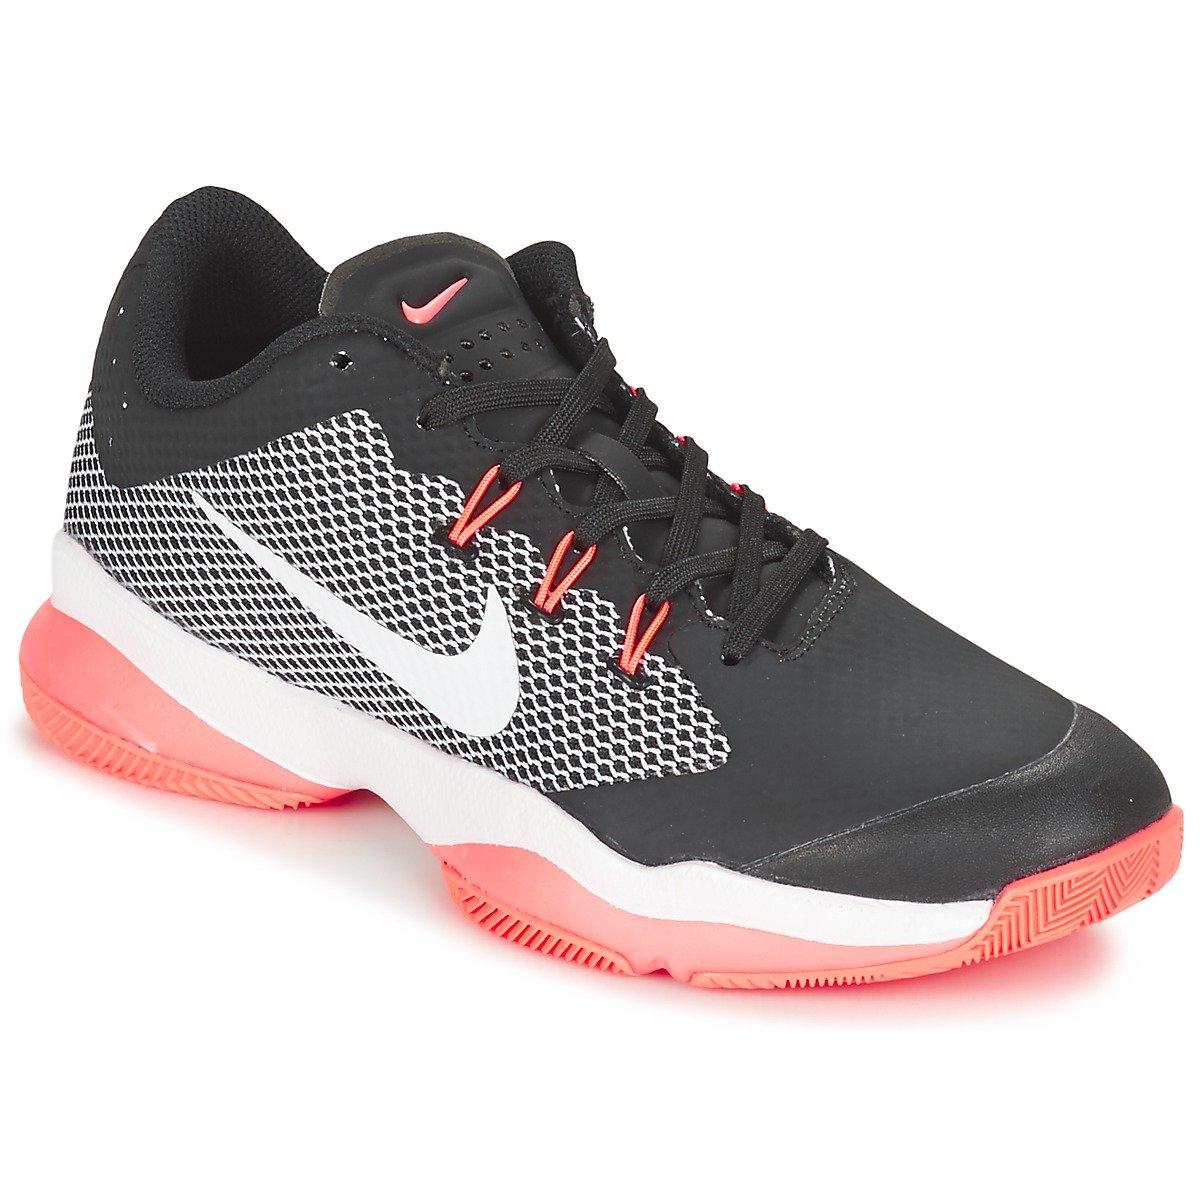 NIKE Women's Air Zoom Ultra Tennis Shoes B01FSDI24Y 11 B(M) US|Black/Pink